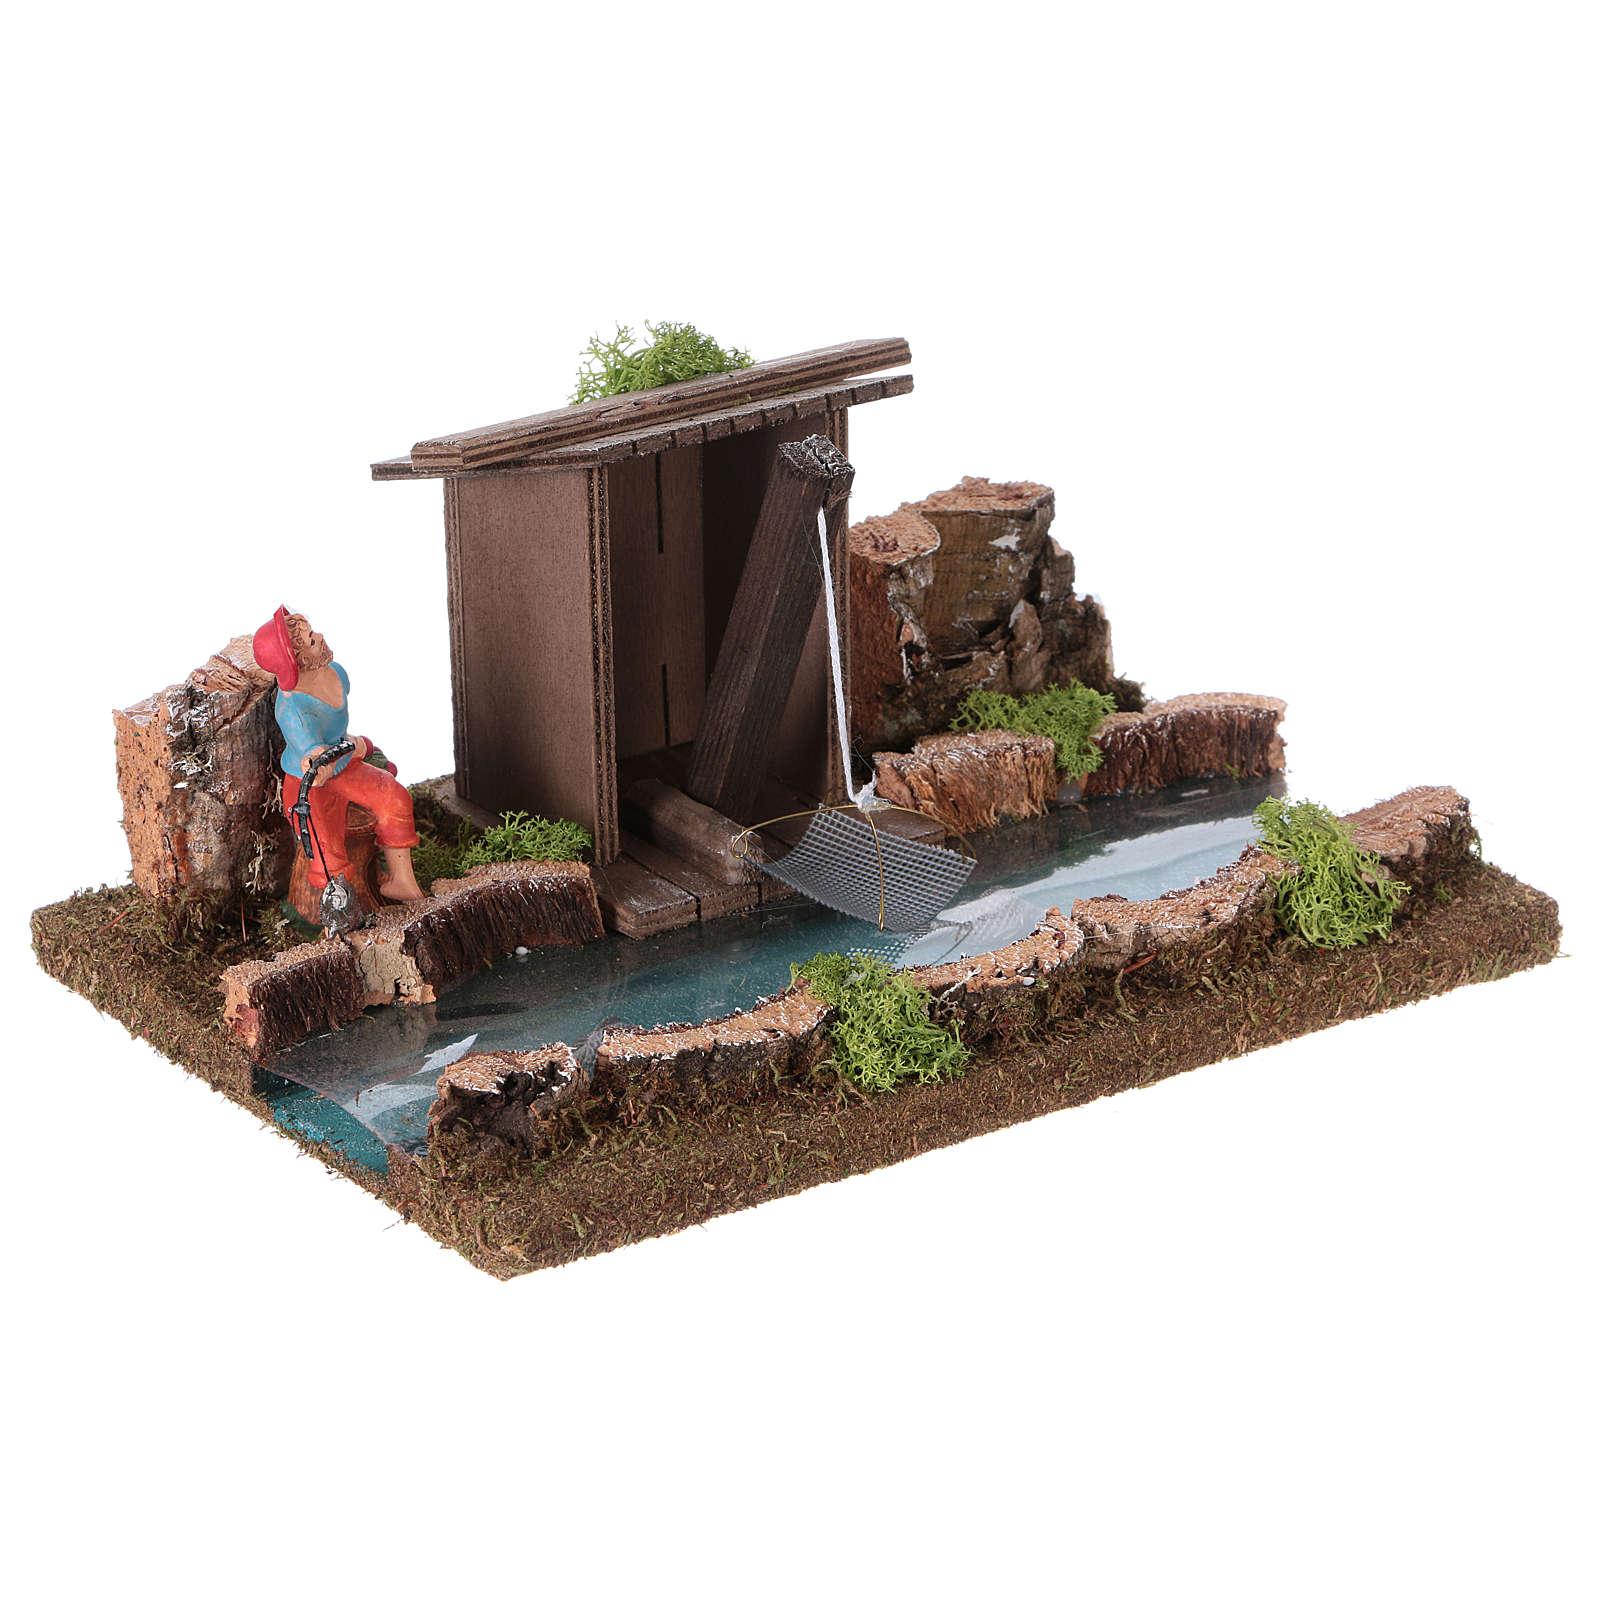 Nativity setting, river with fisherman's hut 4